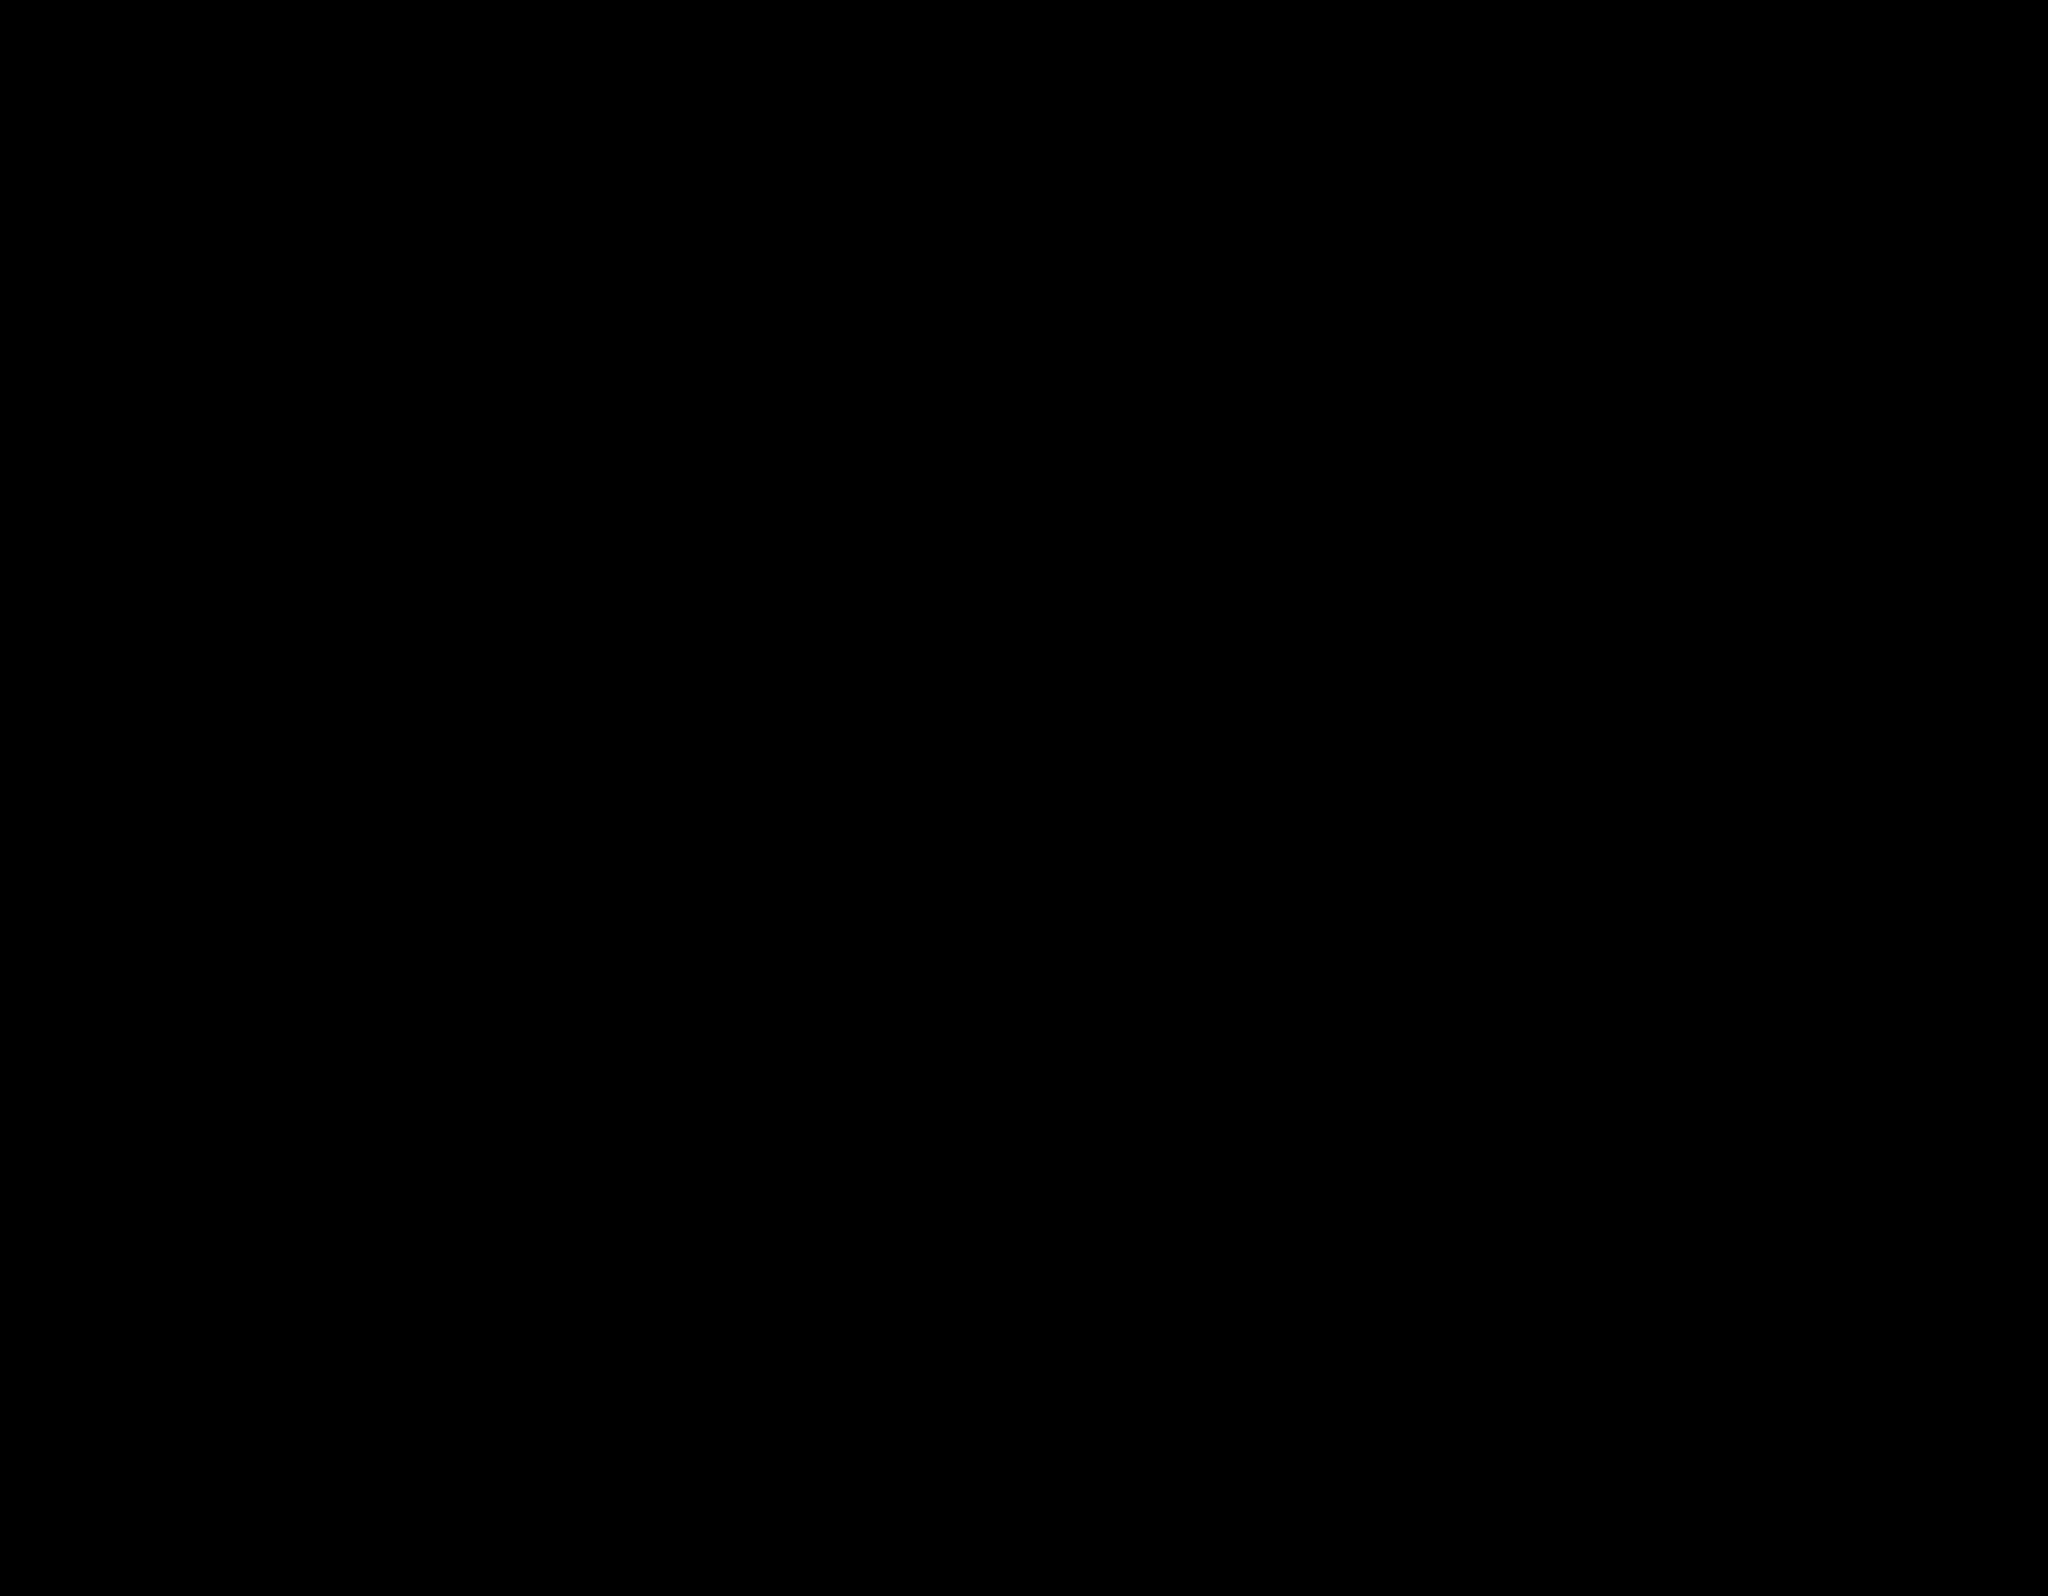 kv-image